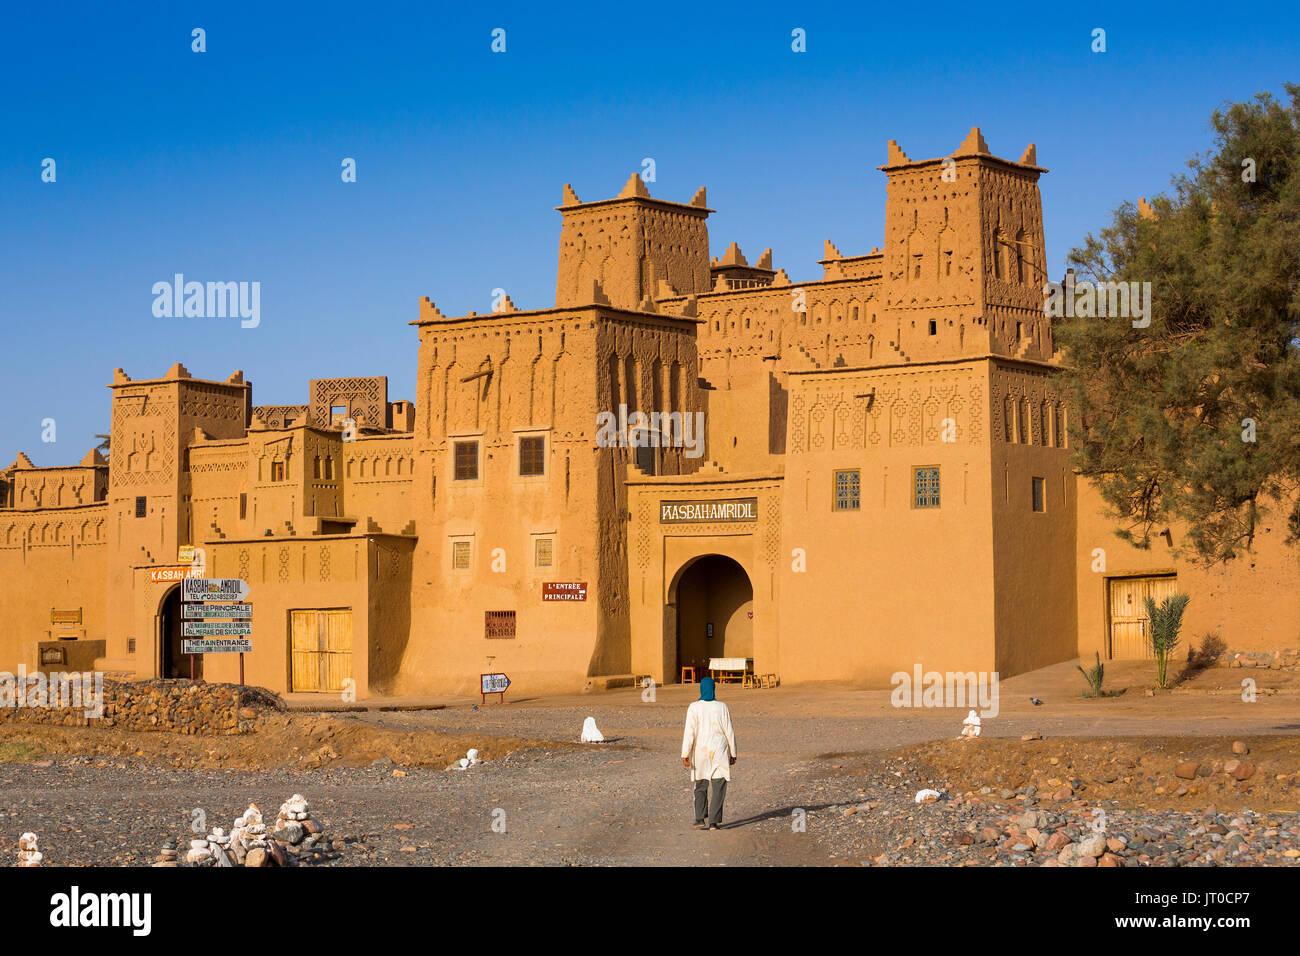 Hotel Kasbah Amridil, Dades Tal, Skoura. Marokko, Maghreb Nordafrika Stockbild